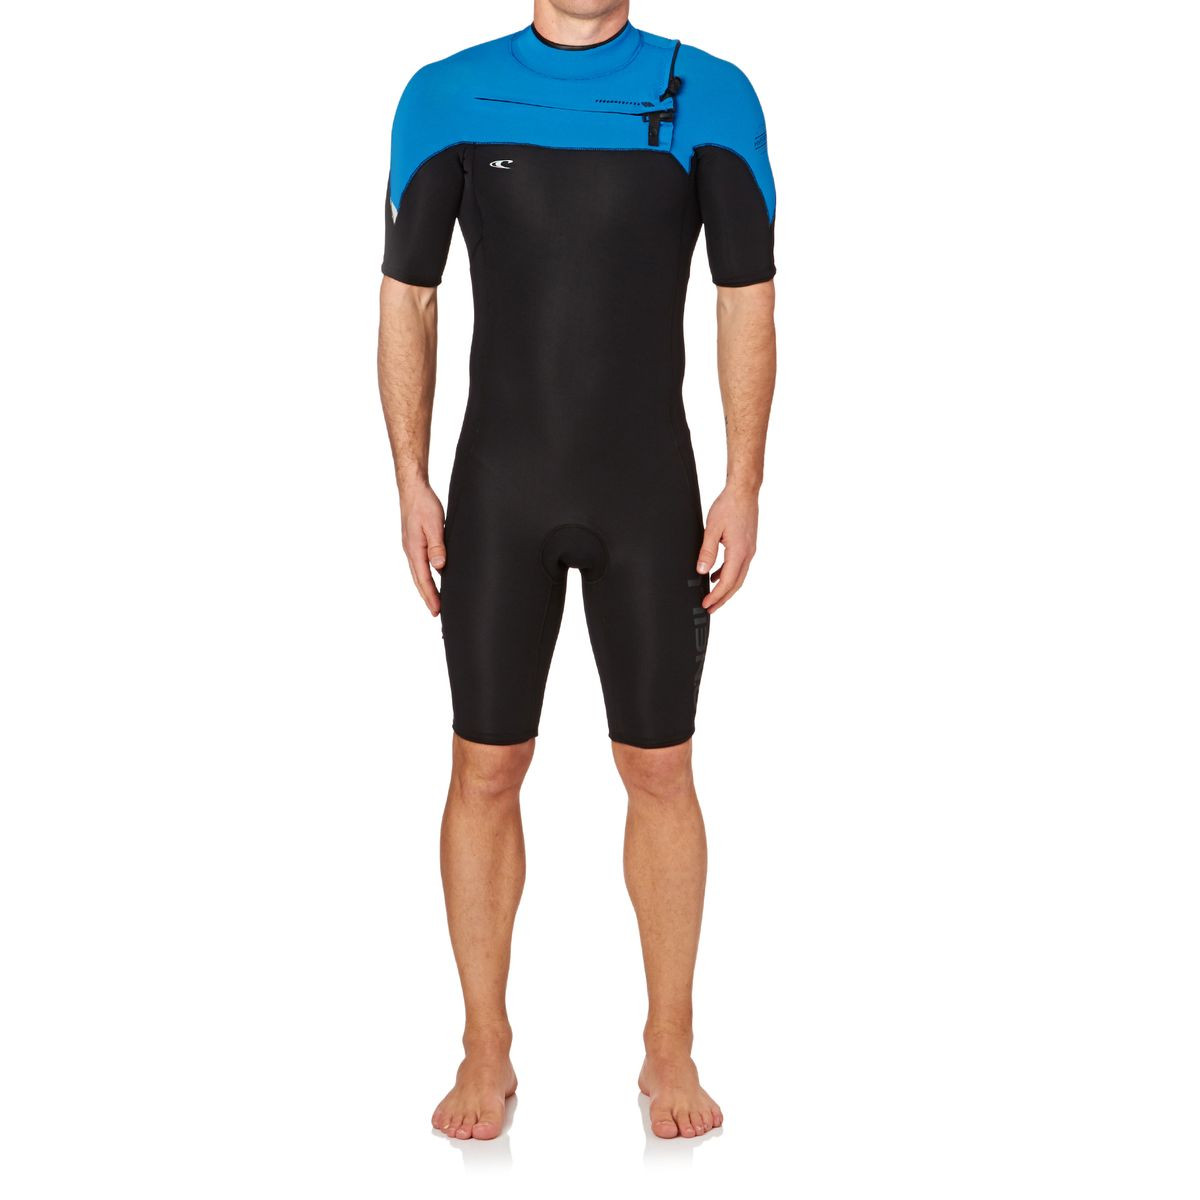 O'Neill Hyperfreak 2mm 2007 Chest Zip Short Sleeve Shorty Wetsuit - Black/ Bright Blue/ Cool Grey